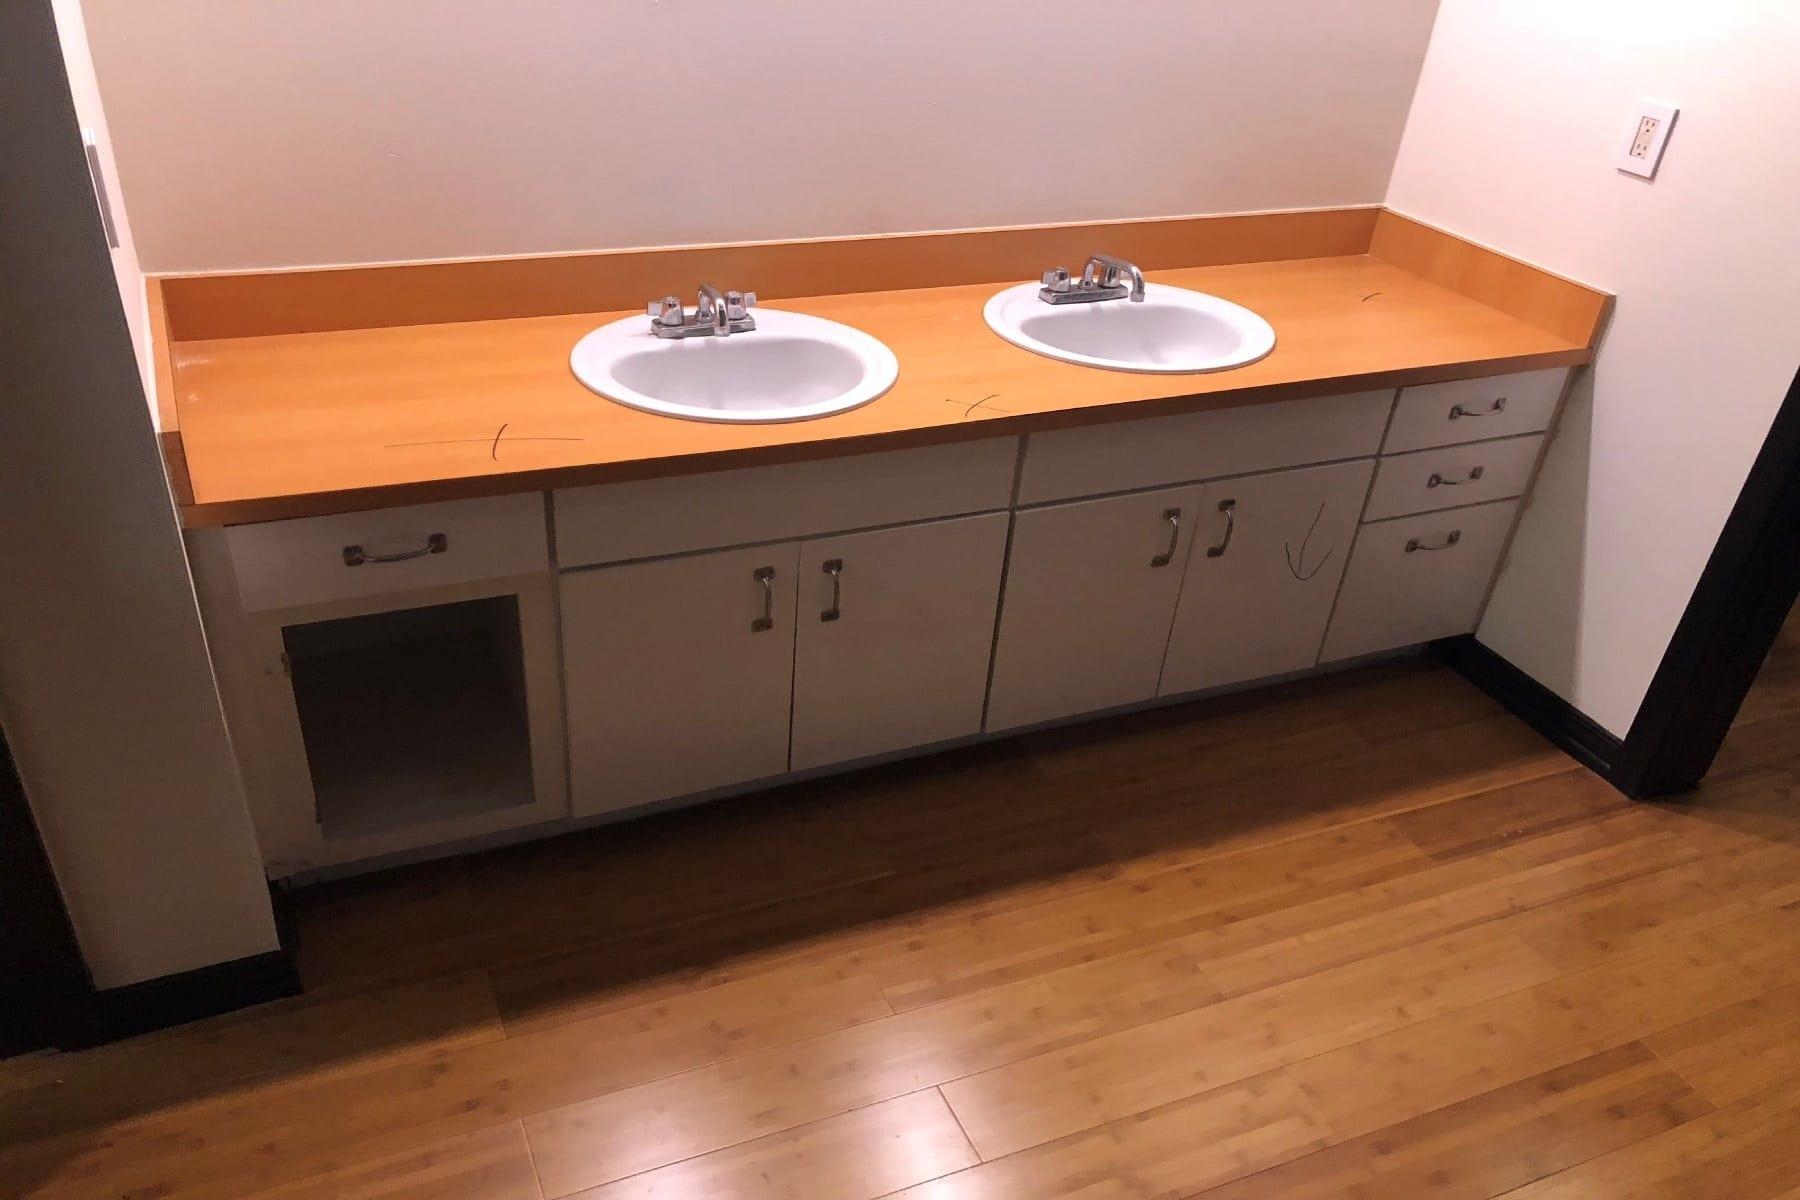 Vanity Before Uptown Condo Bathroom Remodel in Master Bath